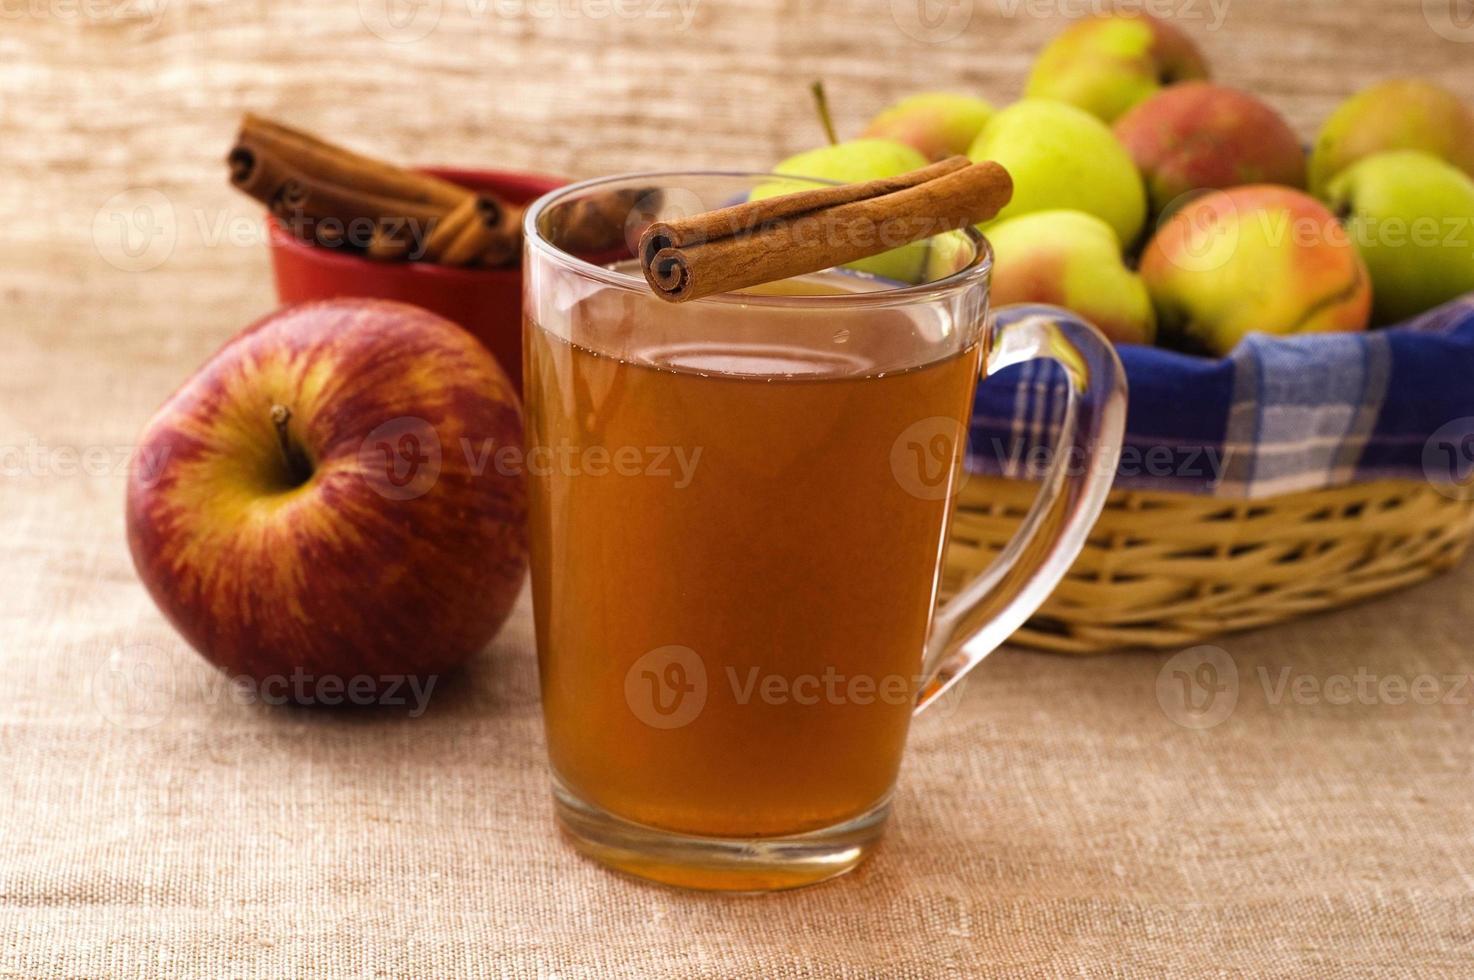 cidra de maçã foto